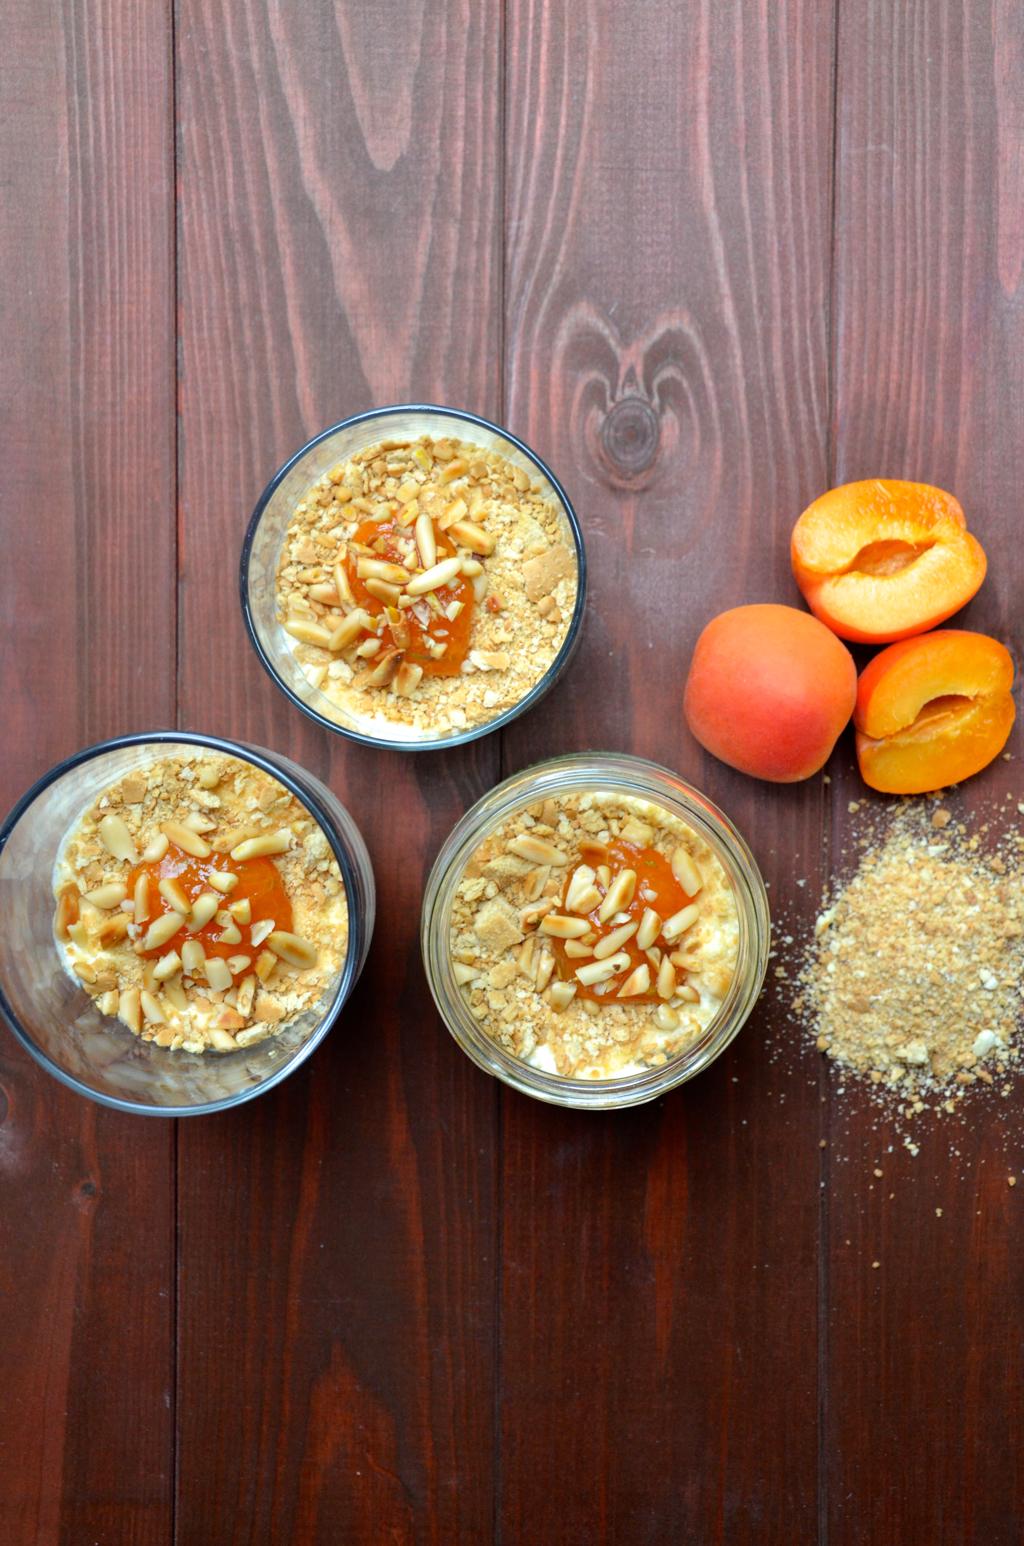 Joghurtcreme mit Keksen und Aprikosenmarmelade